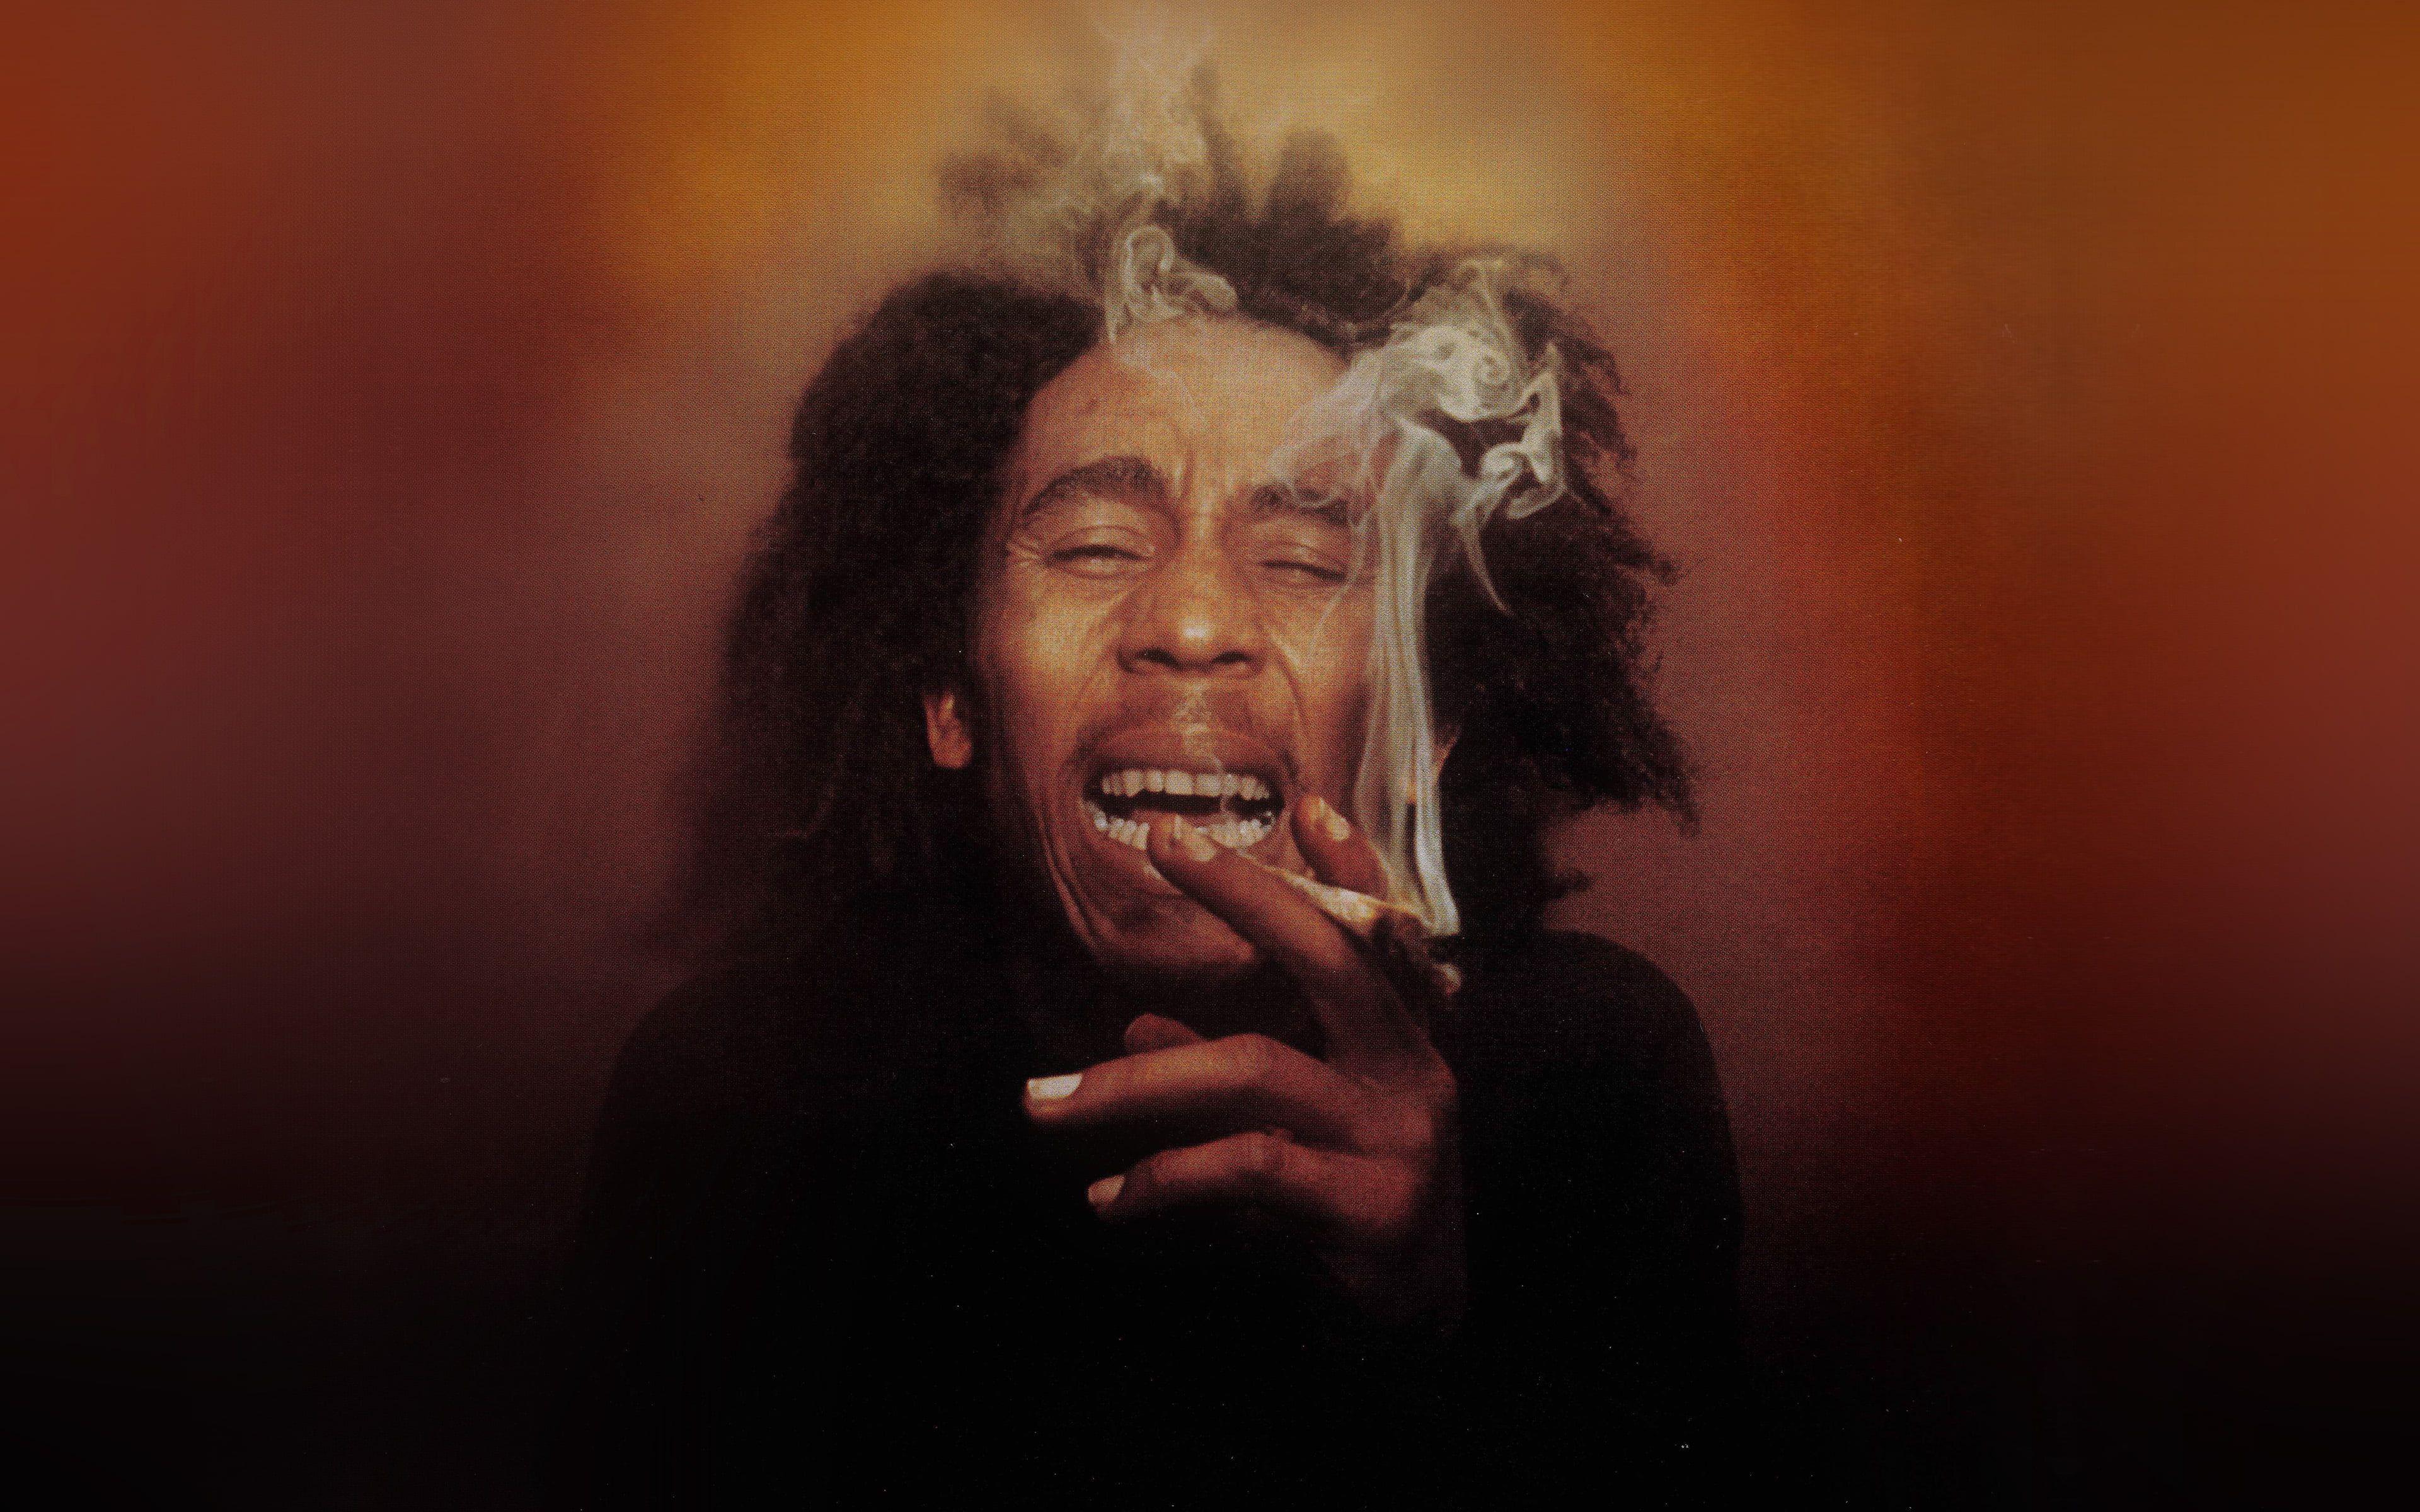 Bob Marley Song Smoke Music 4k Wallpaper Hdwallpaper Desktop Bob Marley Songs Bob Marley Bob Marley Poster